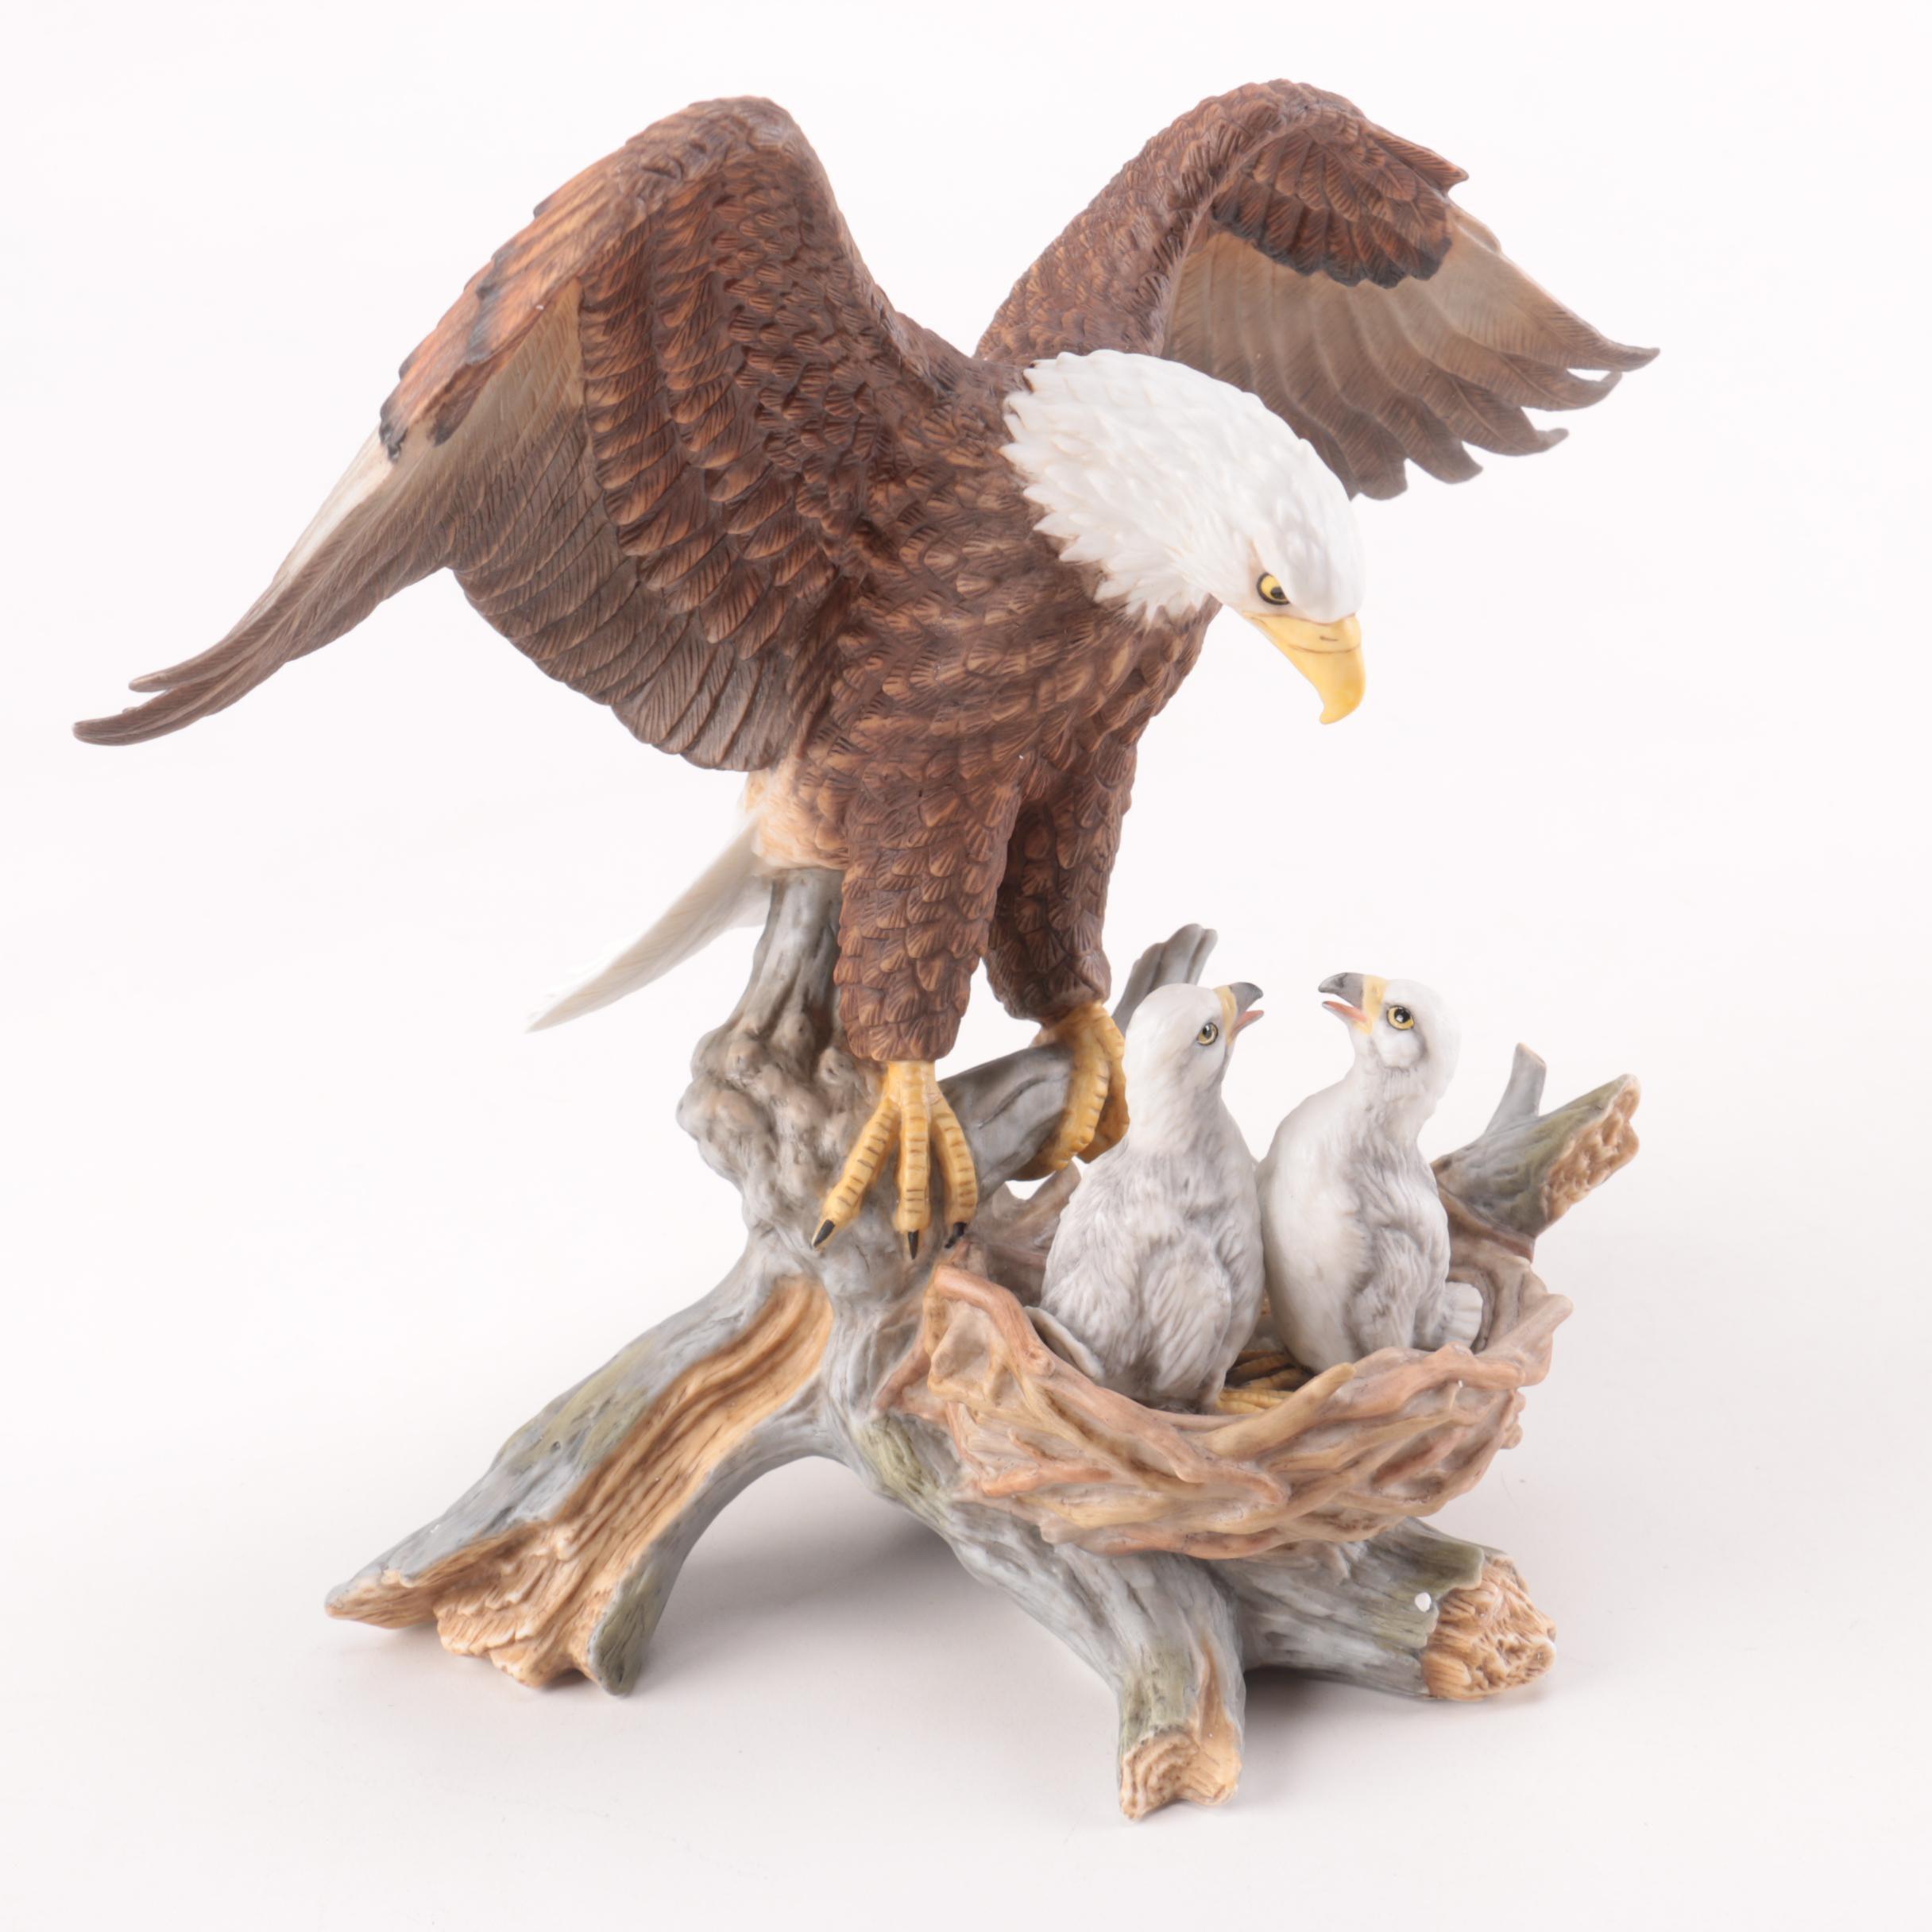 Porcelain Bald Eagle Figurine